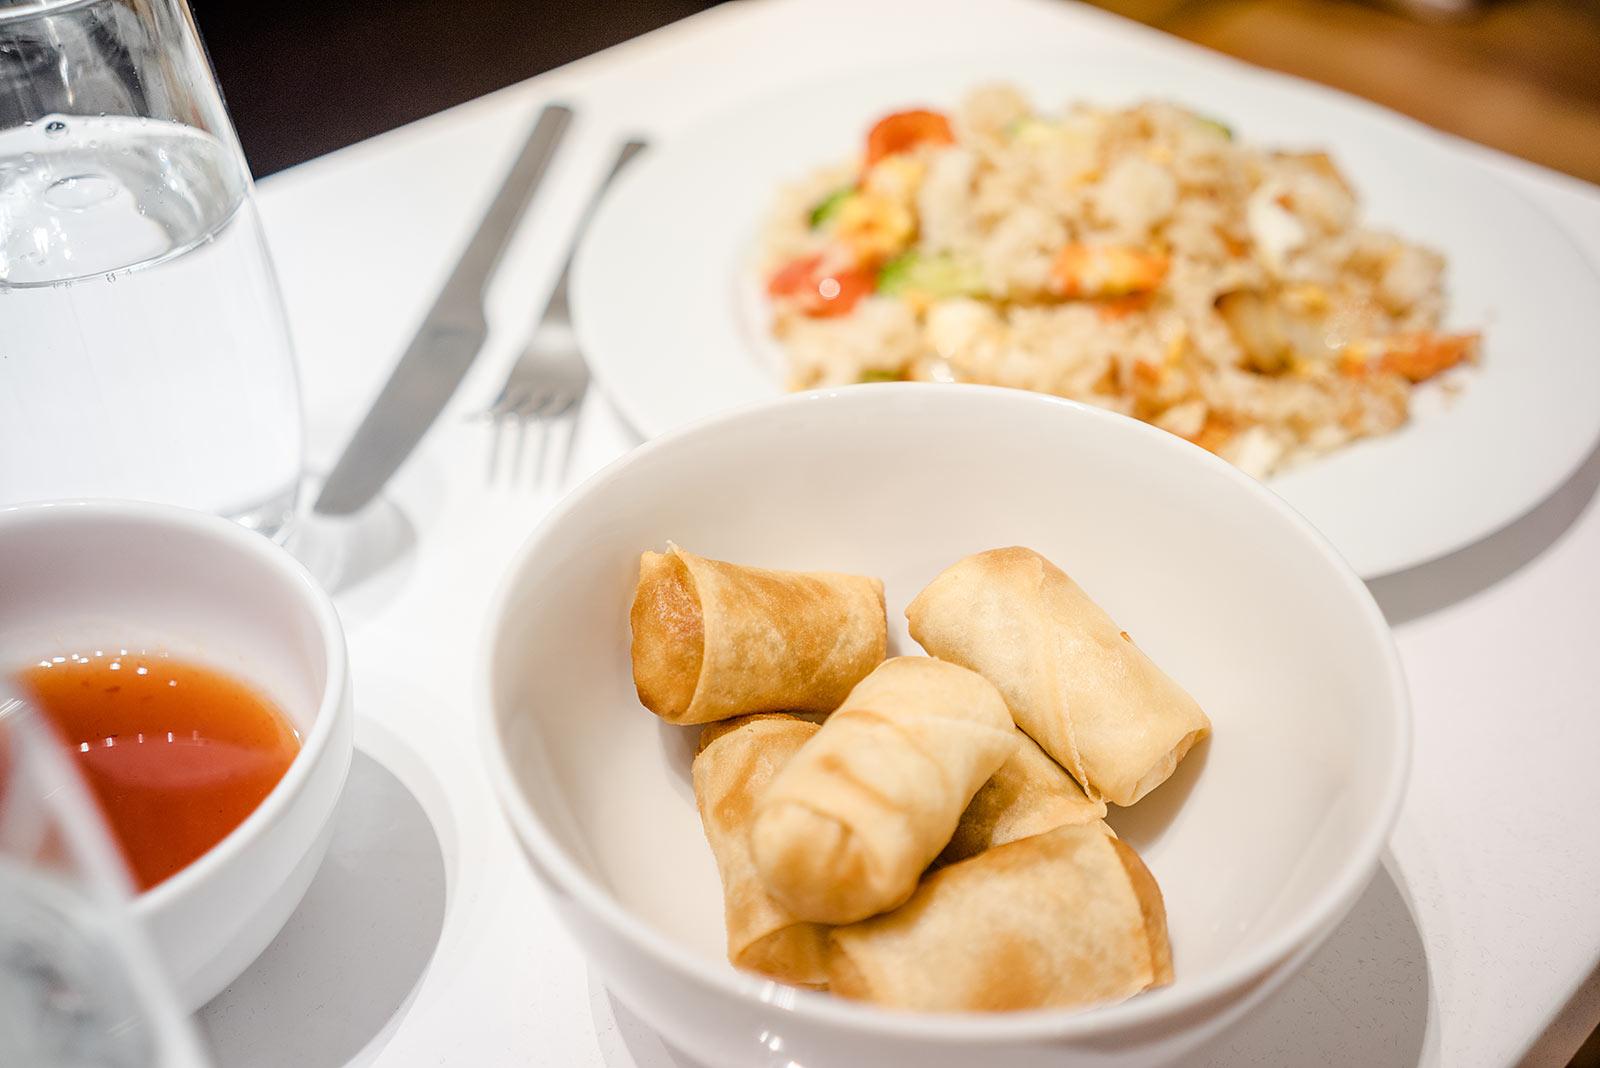 Mekong Düsseldorf foodora Lieferservice China Restaurant Sunnyinga